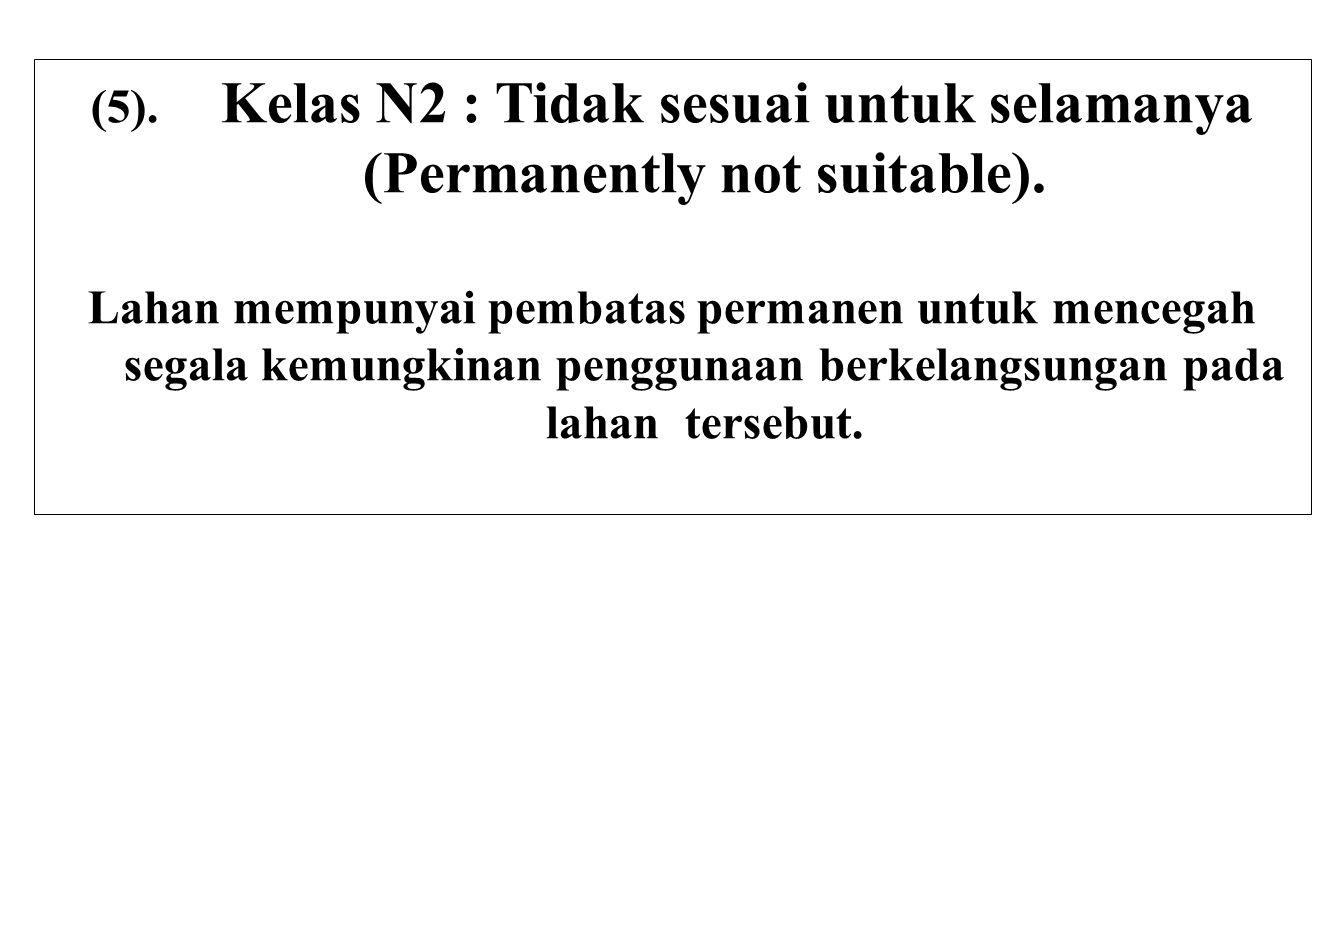 (5).Kelas N2 : Tidak sesuai untuk selamanya (Permanently not suitable).